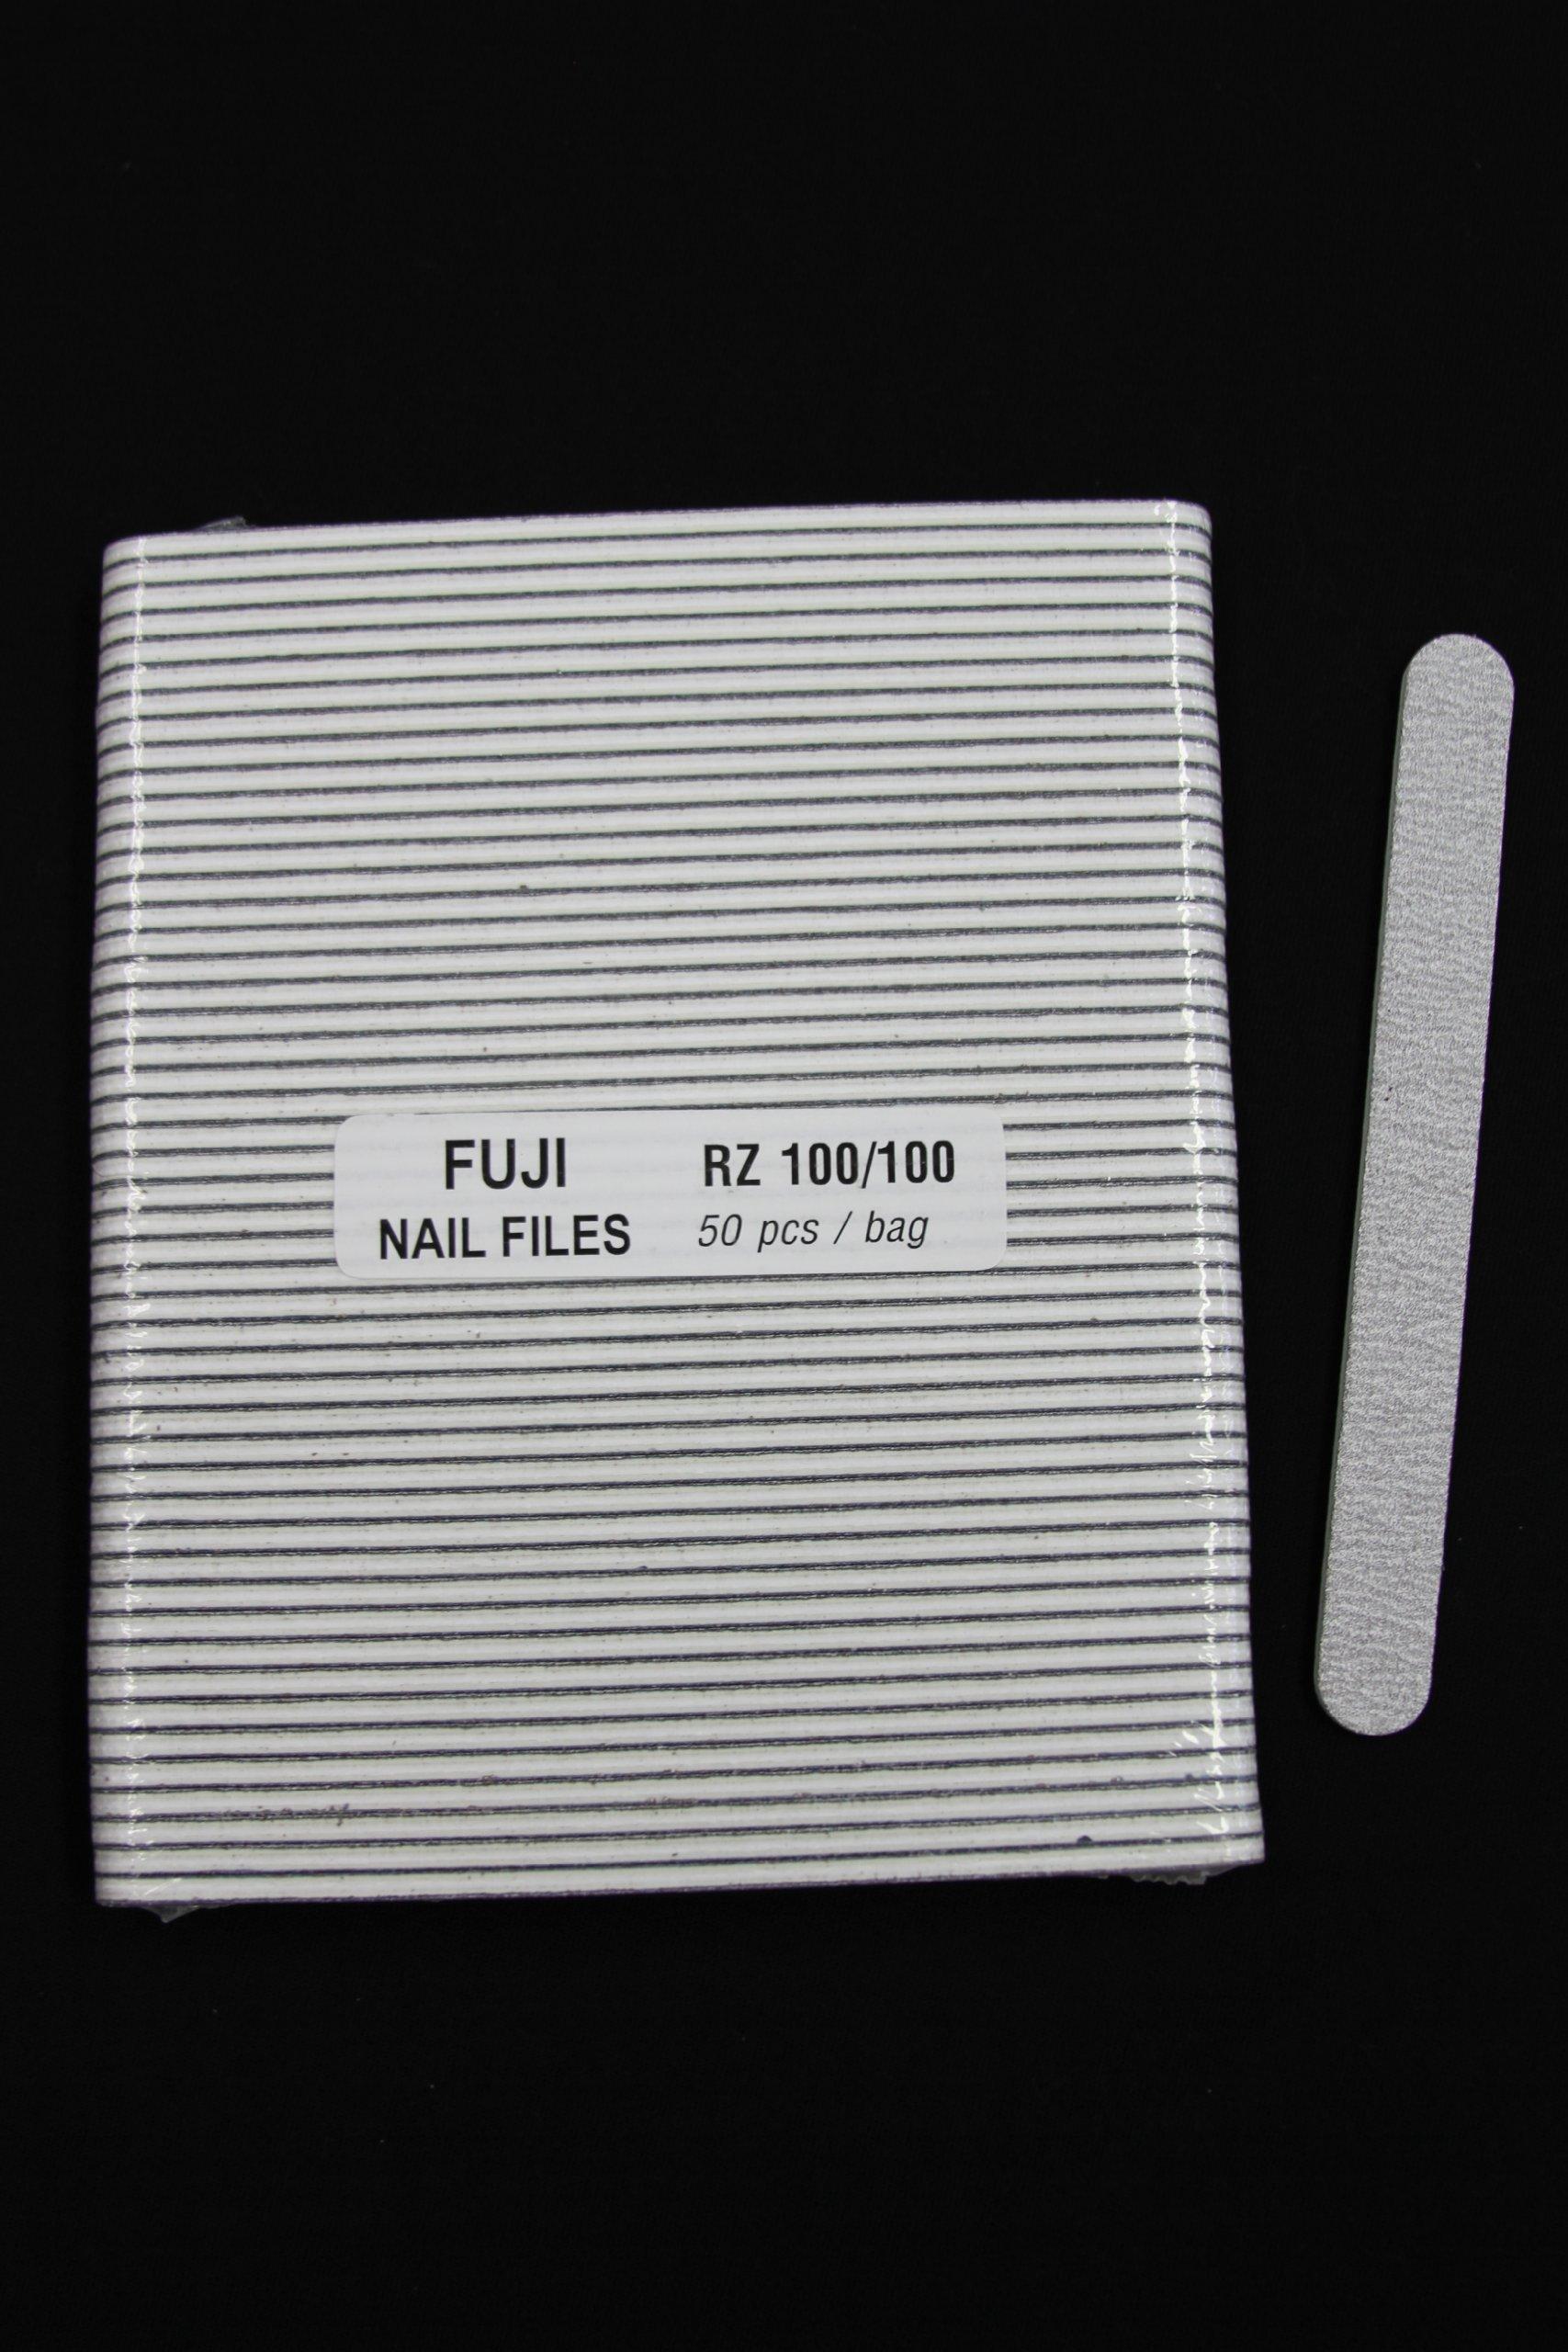 Professional Nail Files Grit 100/100, Coarse Zebra Round (50pcs in a Pack) by Fuji